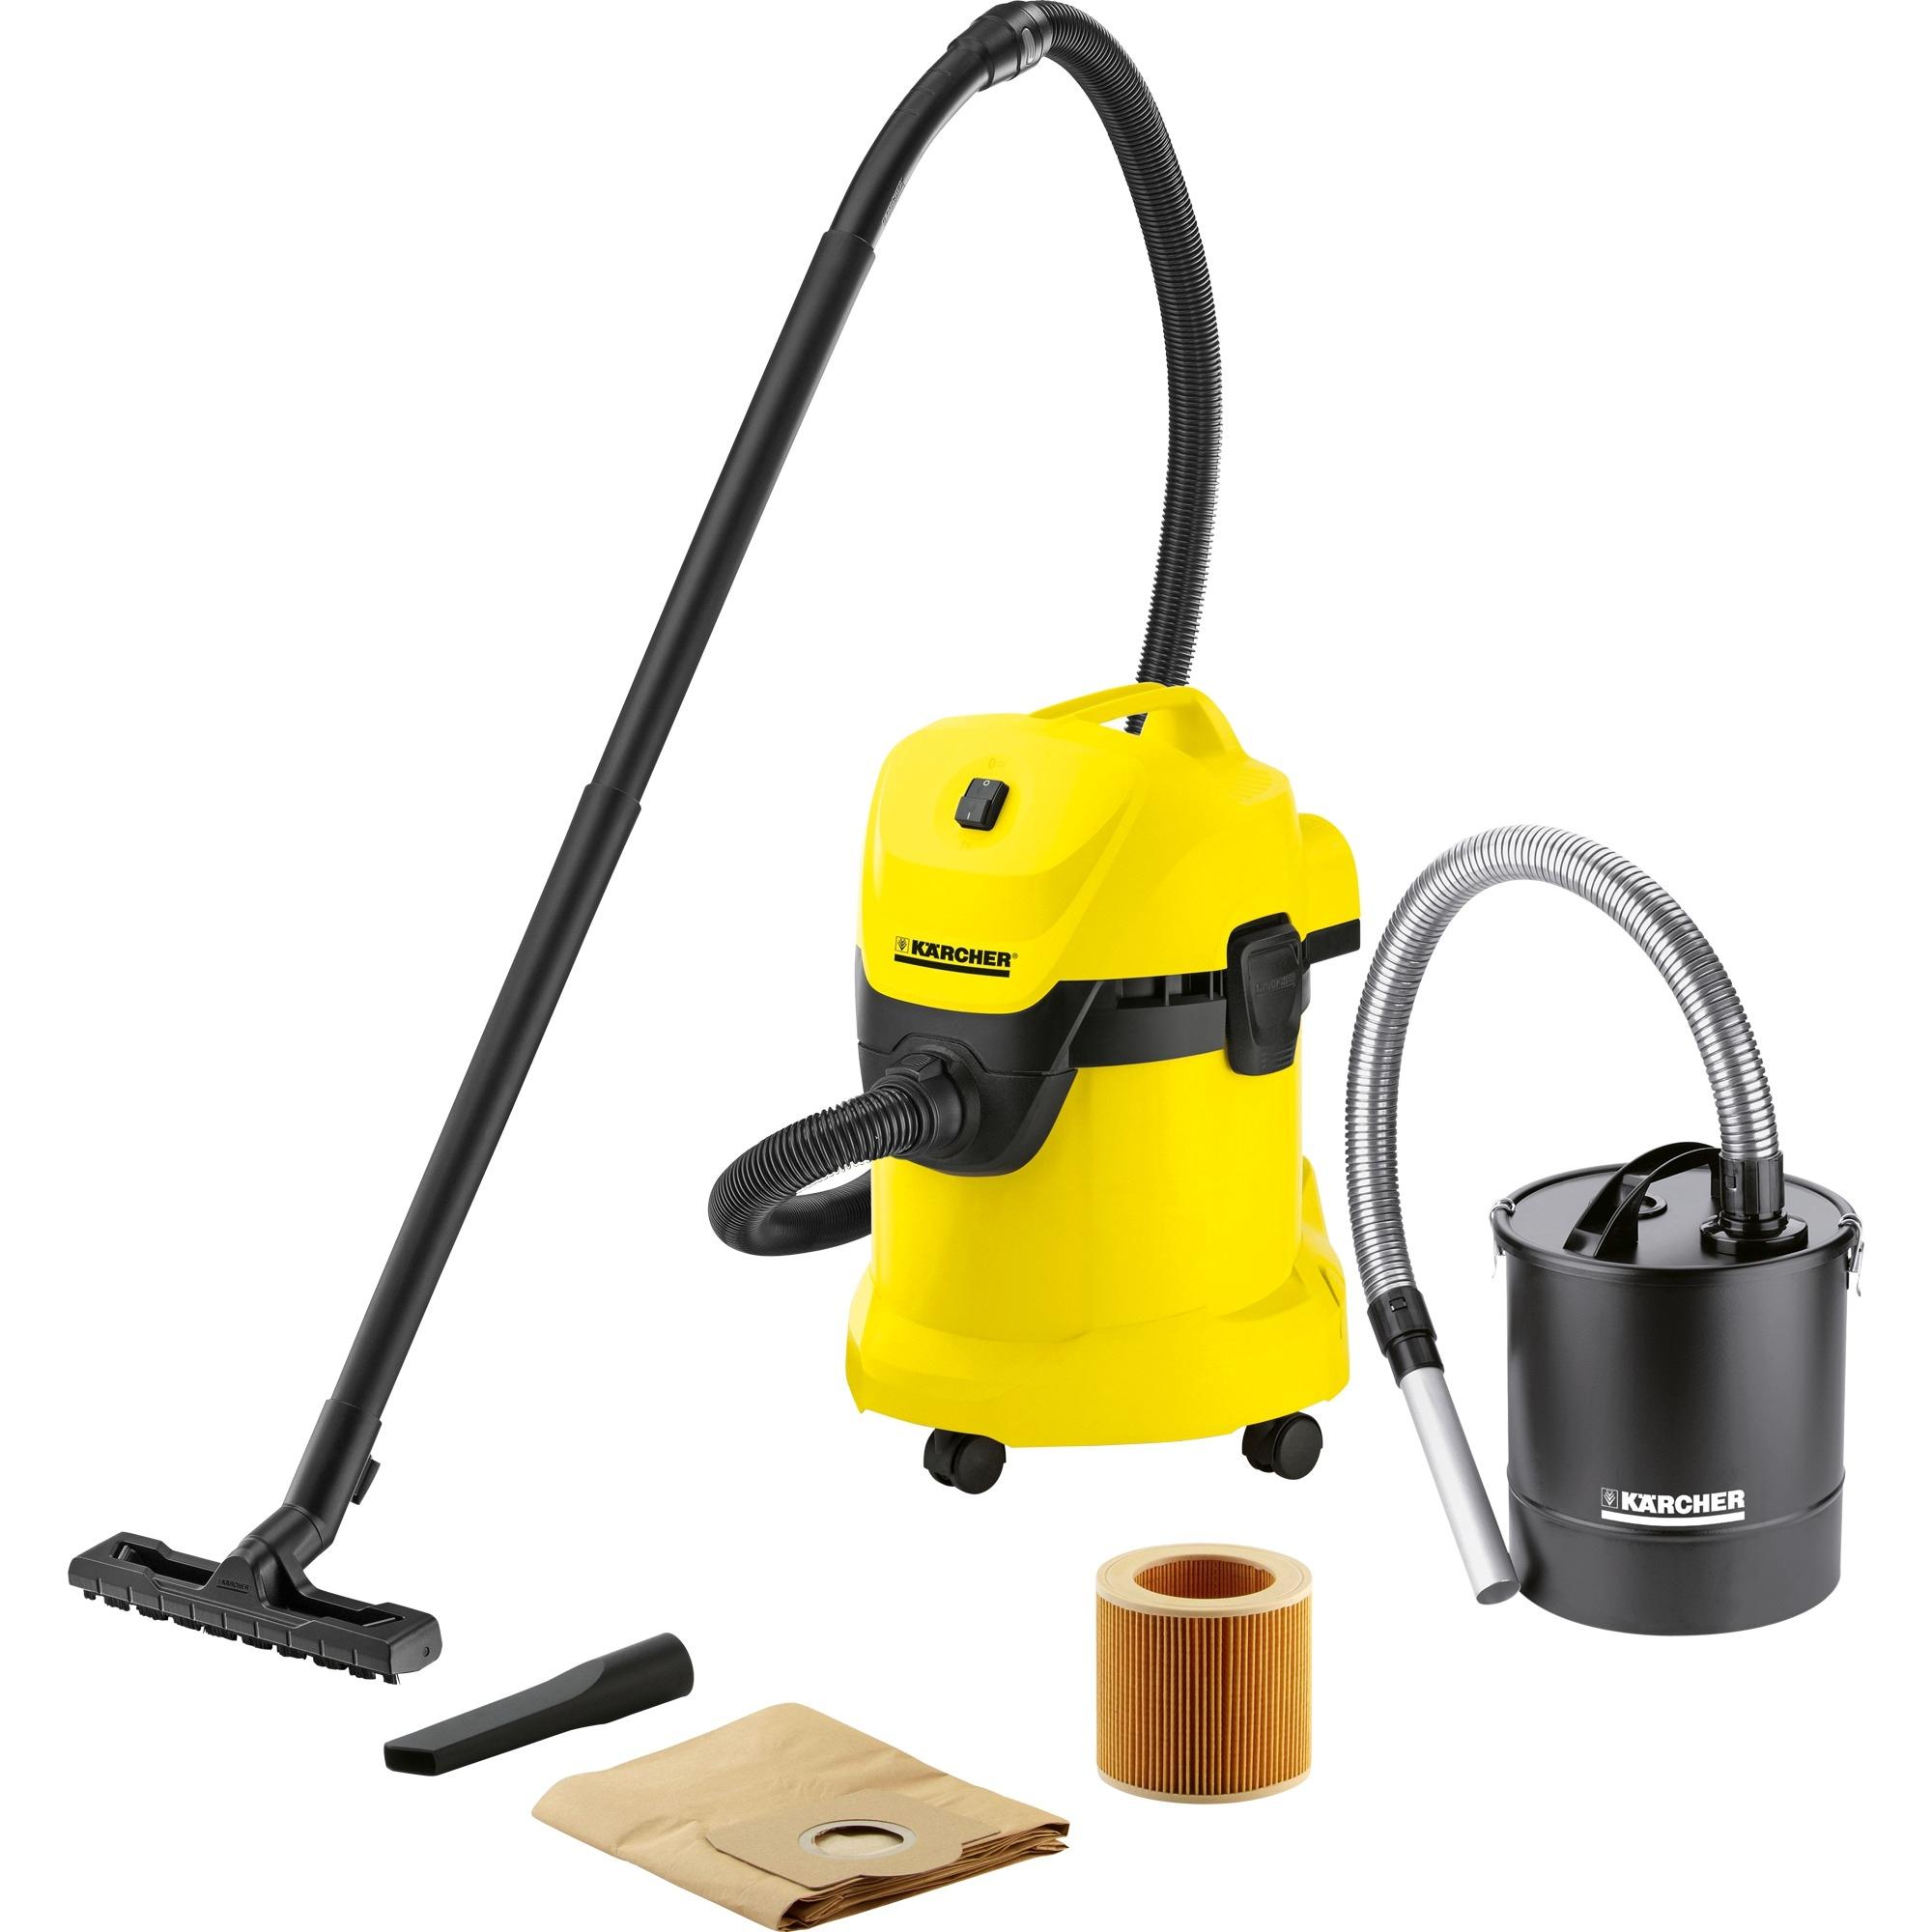 Kärcher Nass- und Trockensauger Mehrzwecksauger WD 3 Fireplace Kit